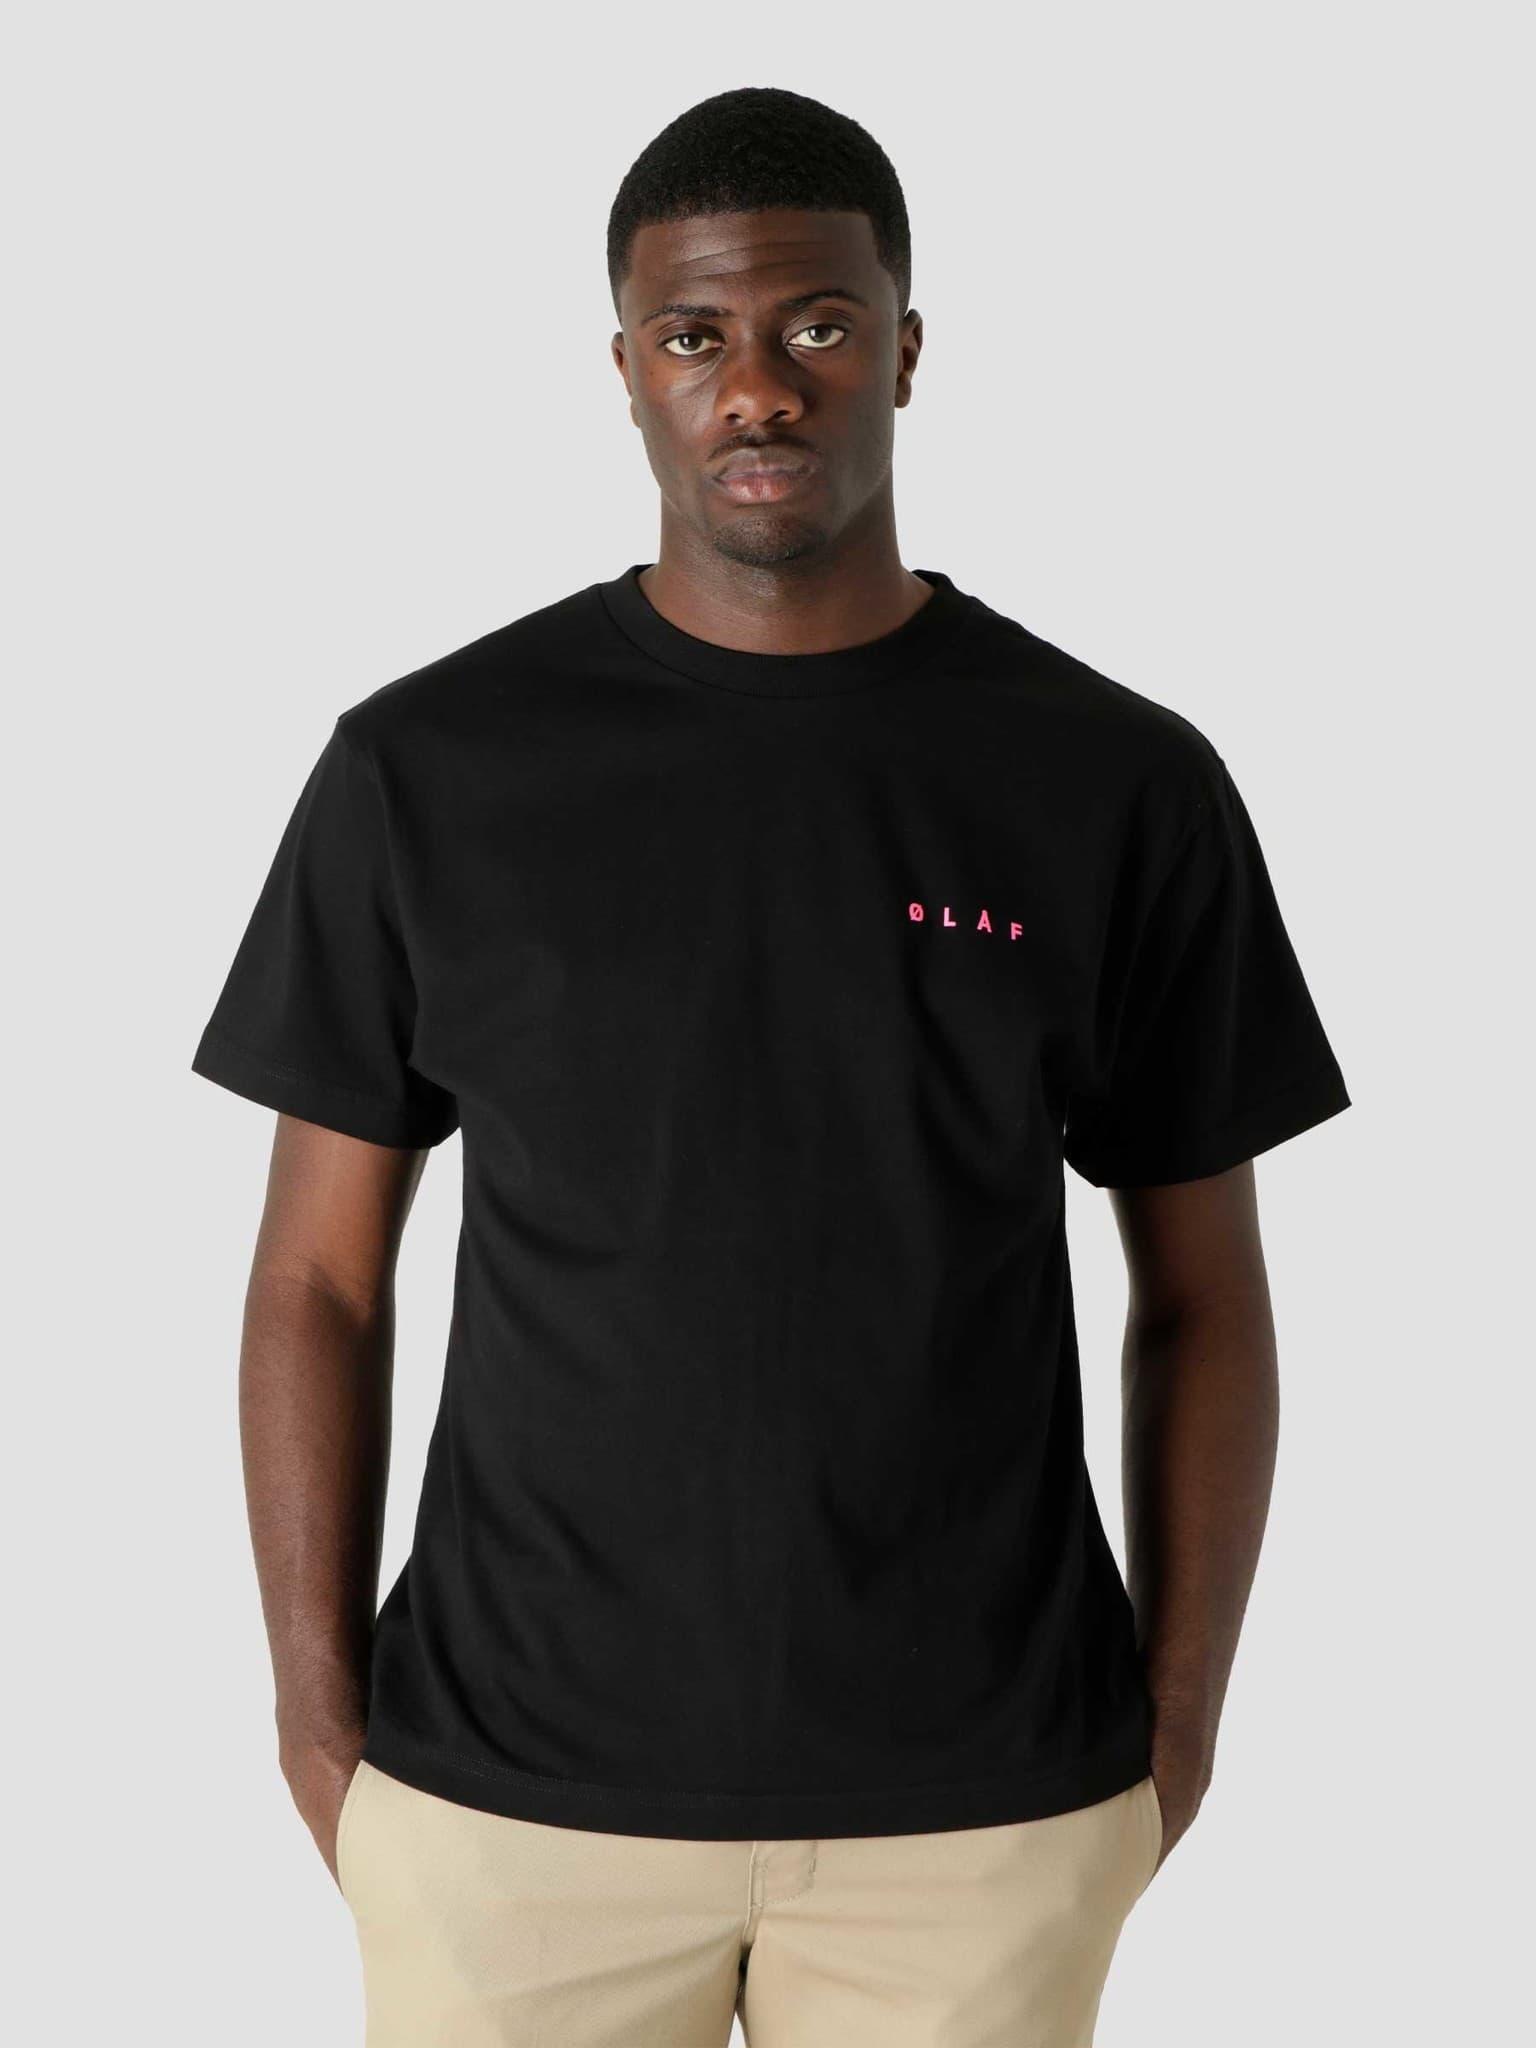 OLAF Face T-Shirt Black Pink